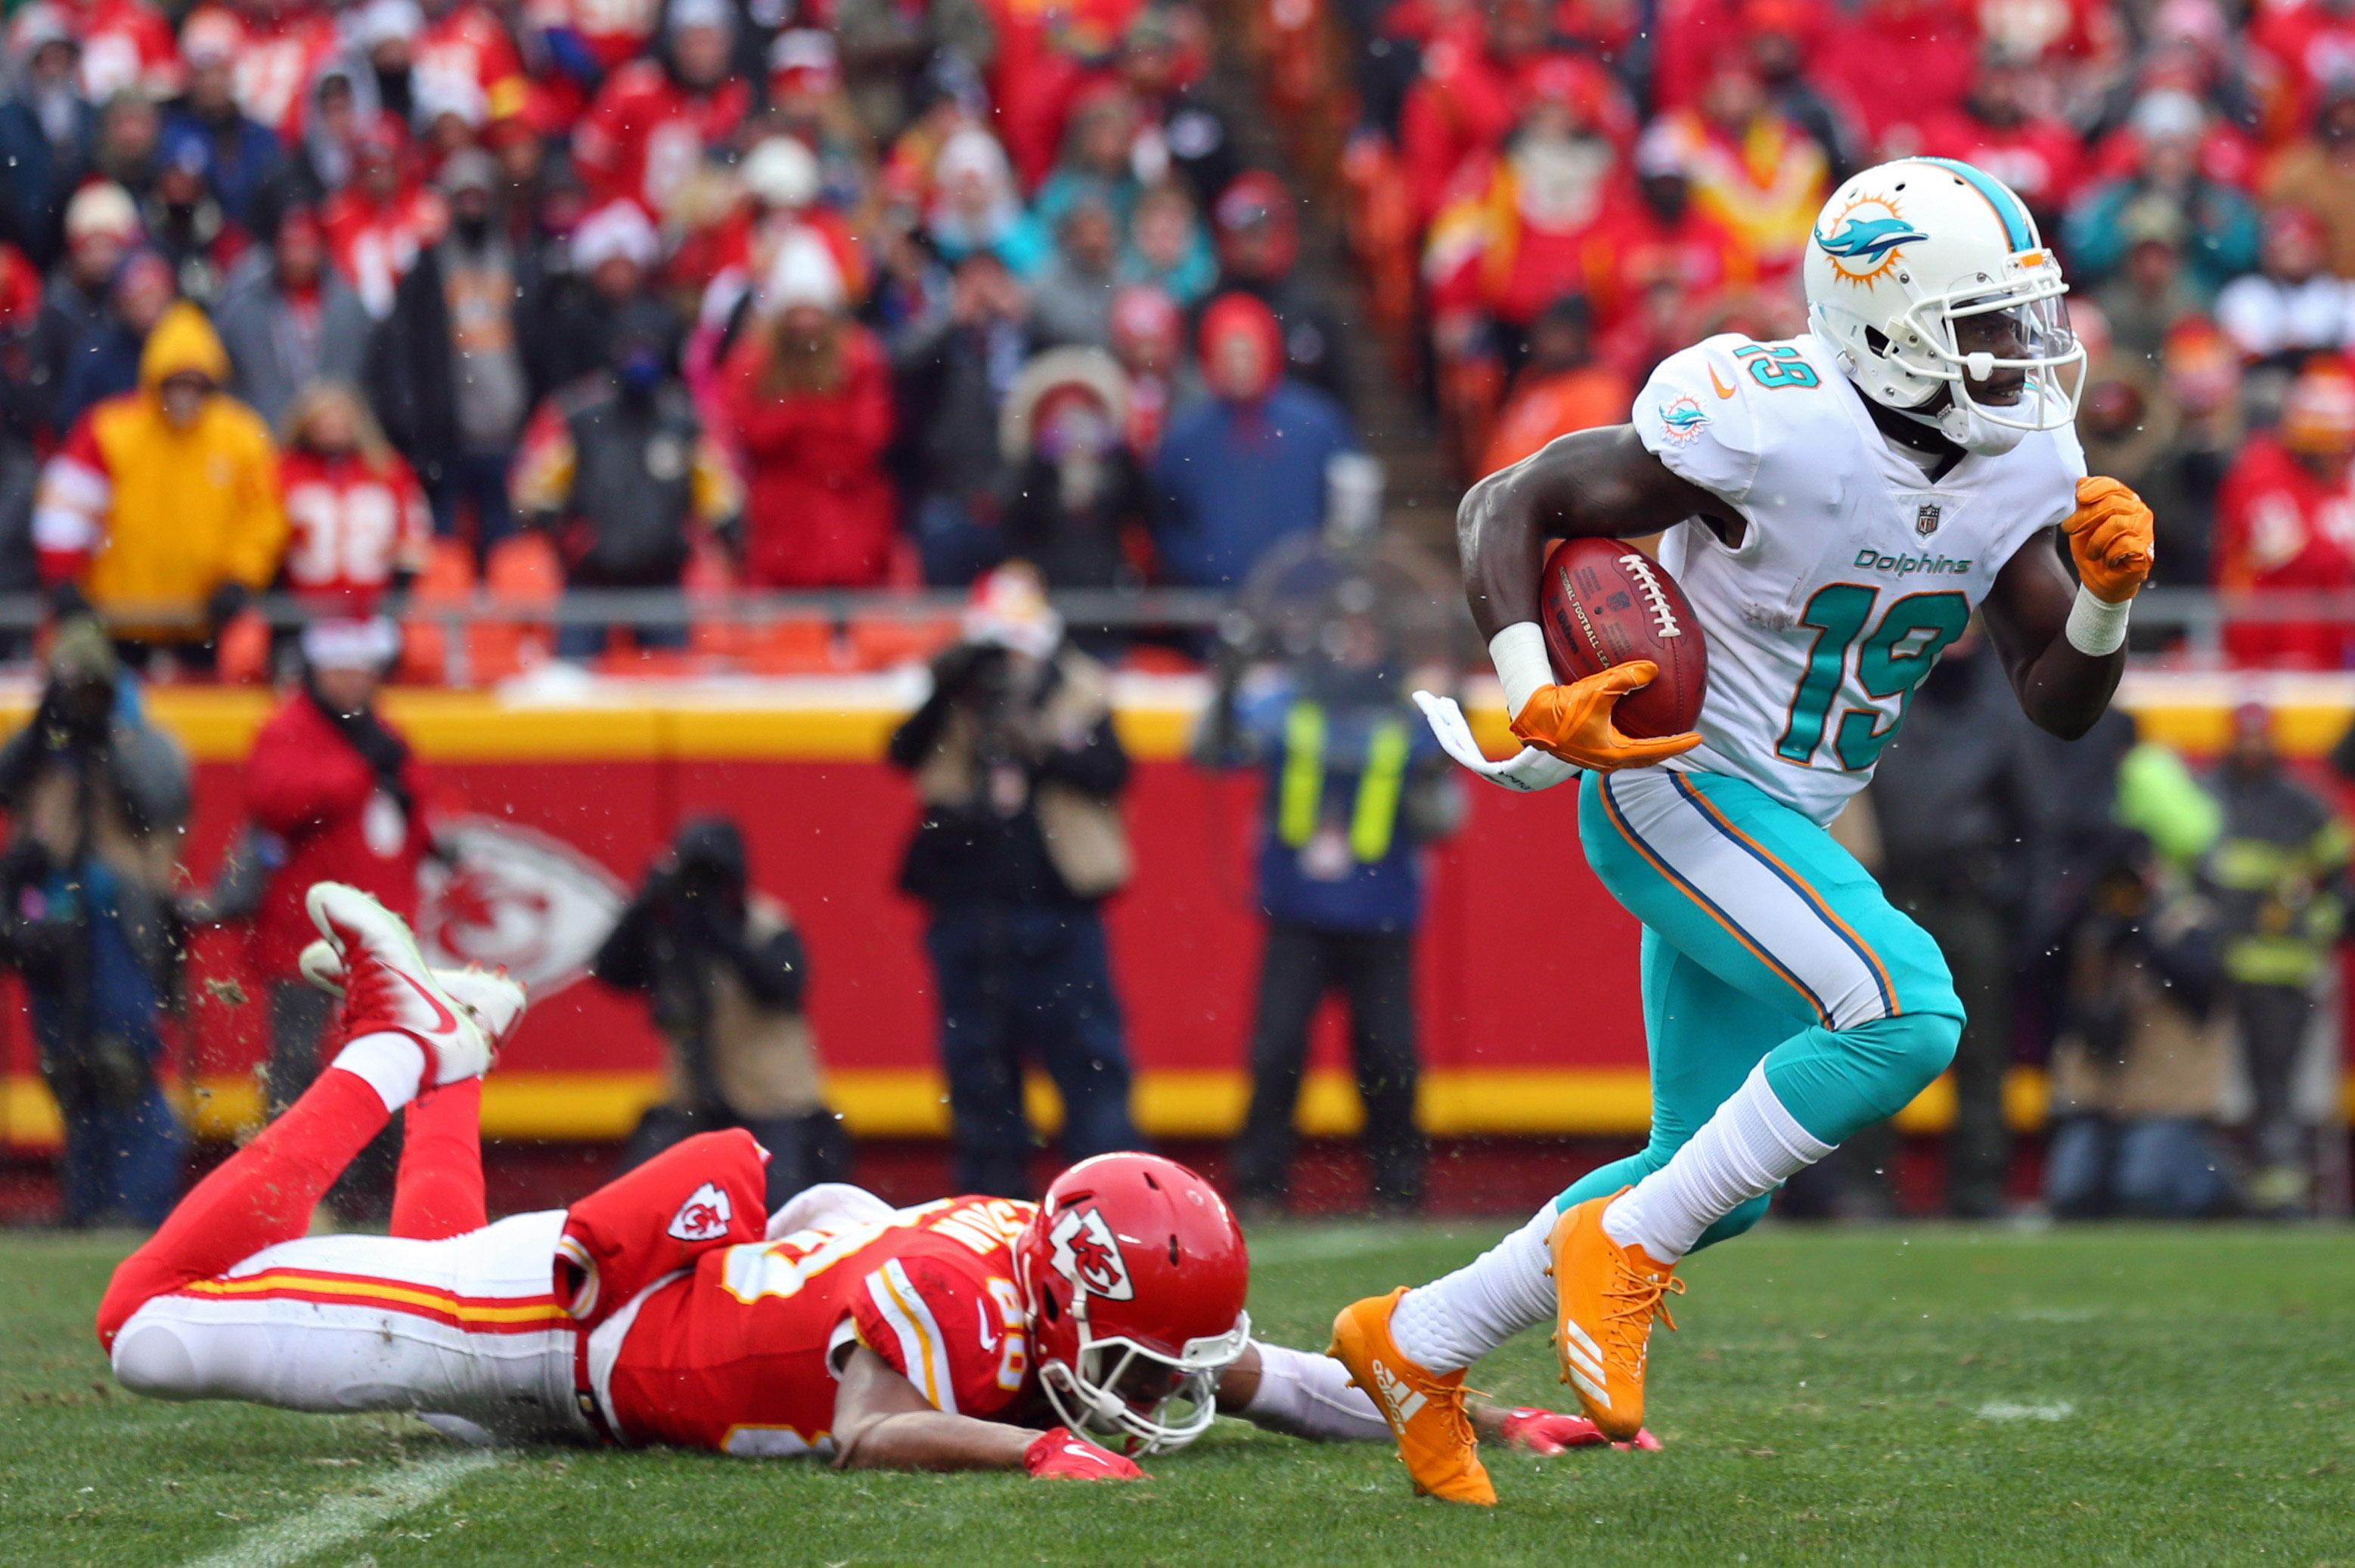 NFL: Miami Dolphins at Kansas City Chiefs